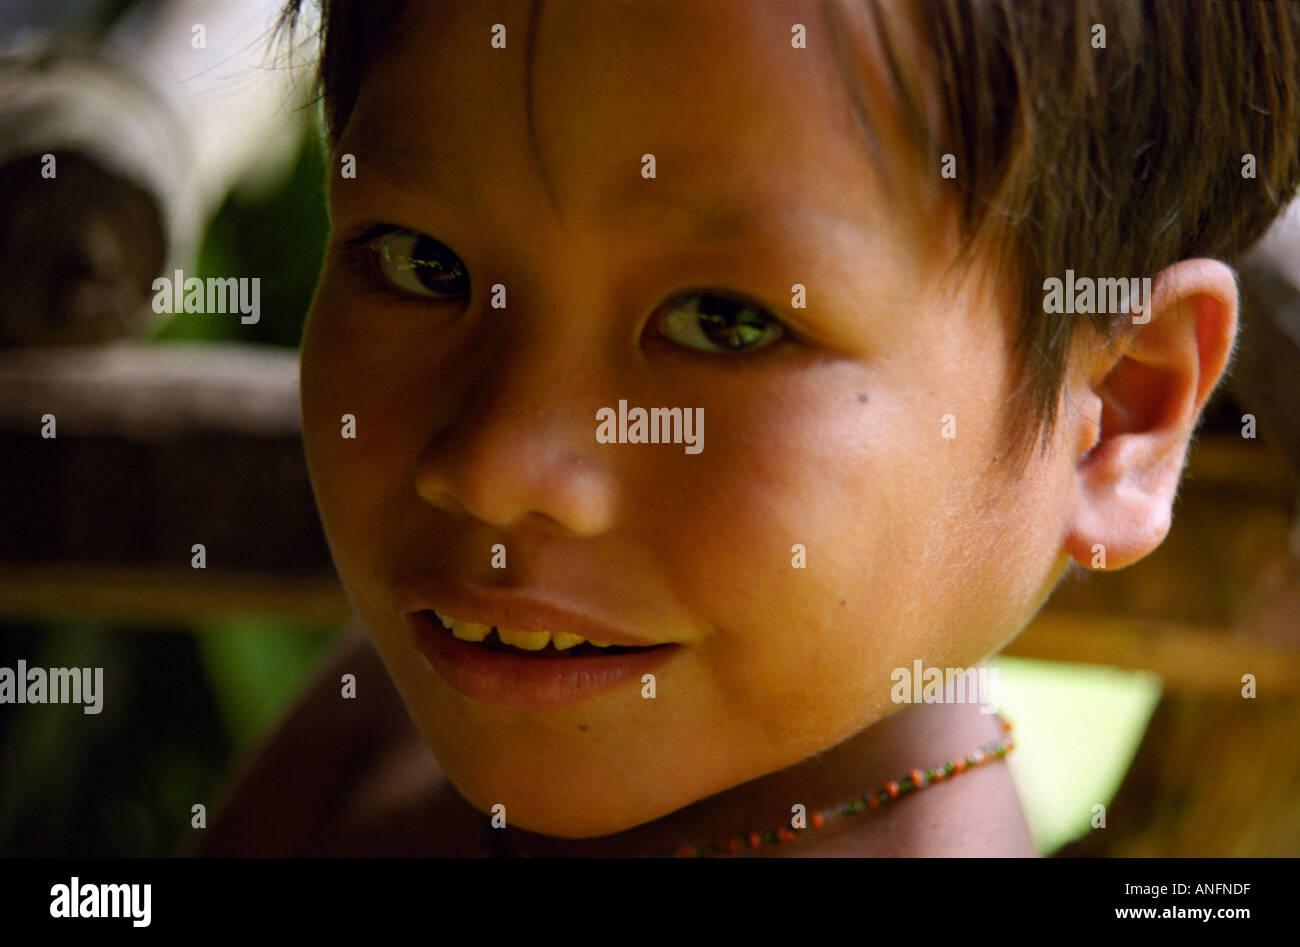 Mentawai boy on the Sumatran island of Siberut - Stock Image